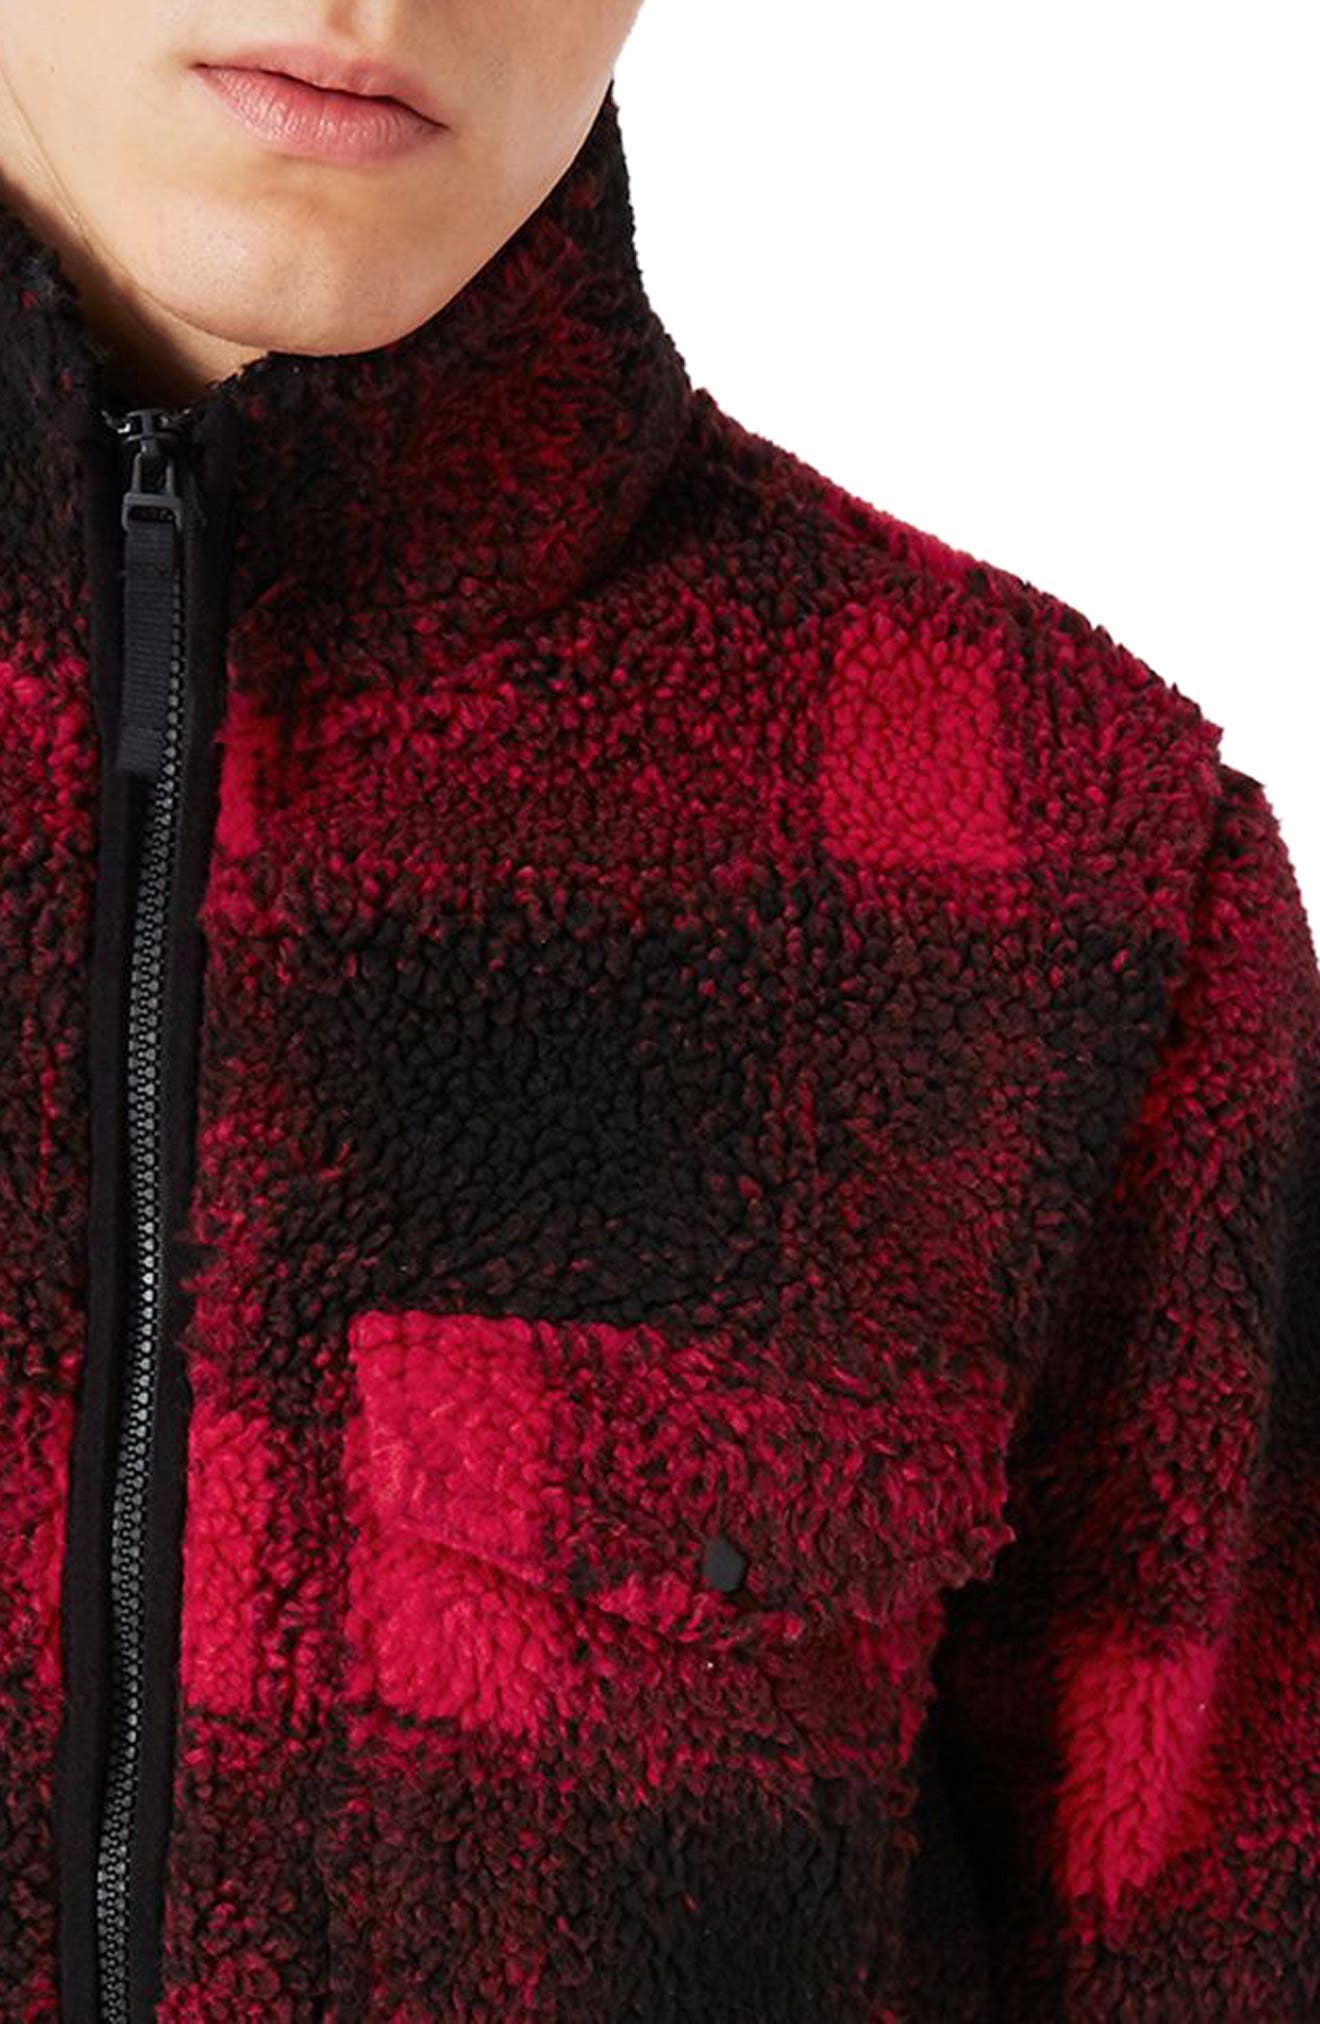 Buffalo Check Borg Jacket,                             Alternate thumbnail 3, color,                             Red Multi